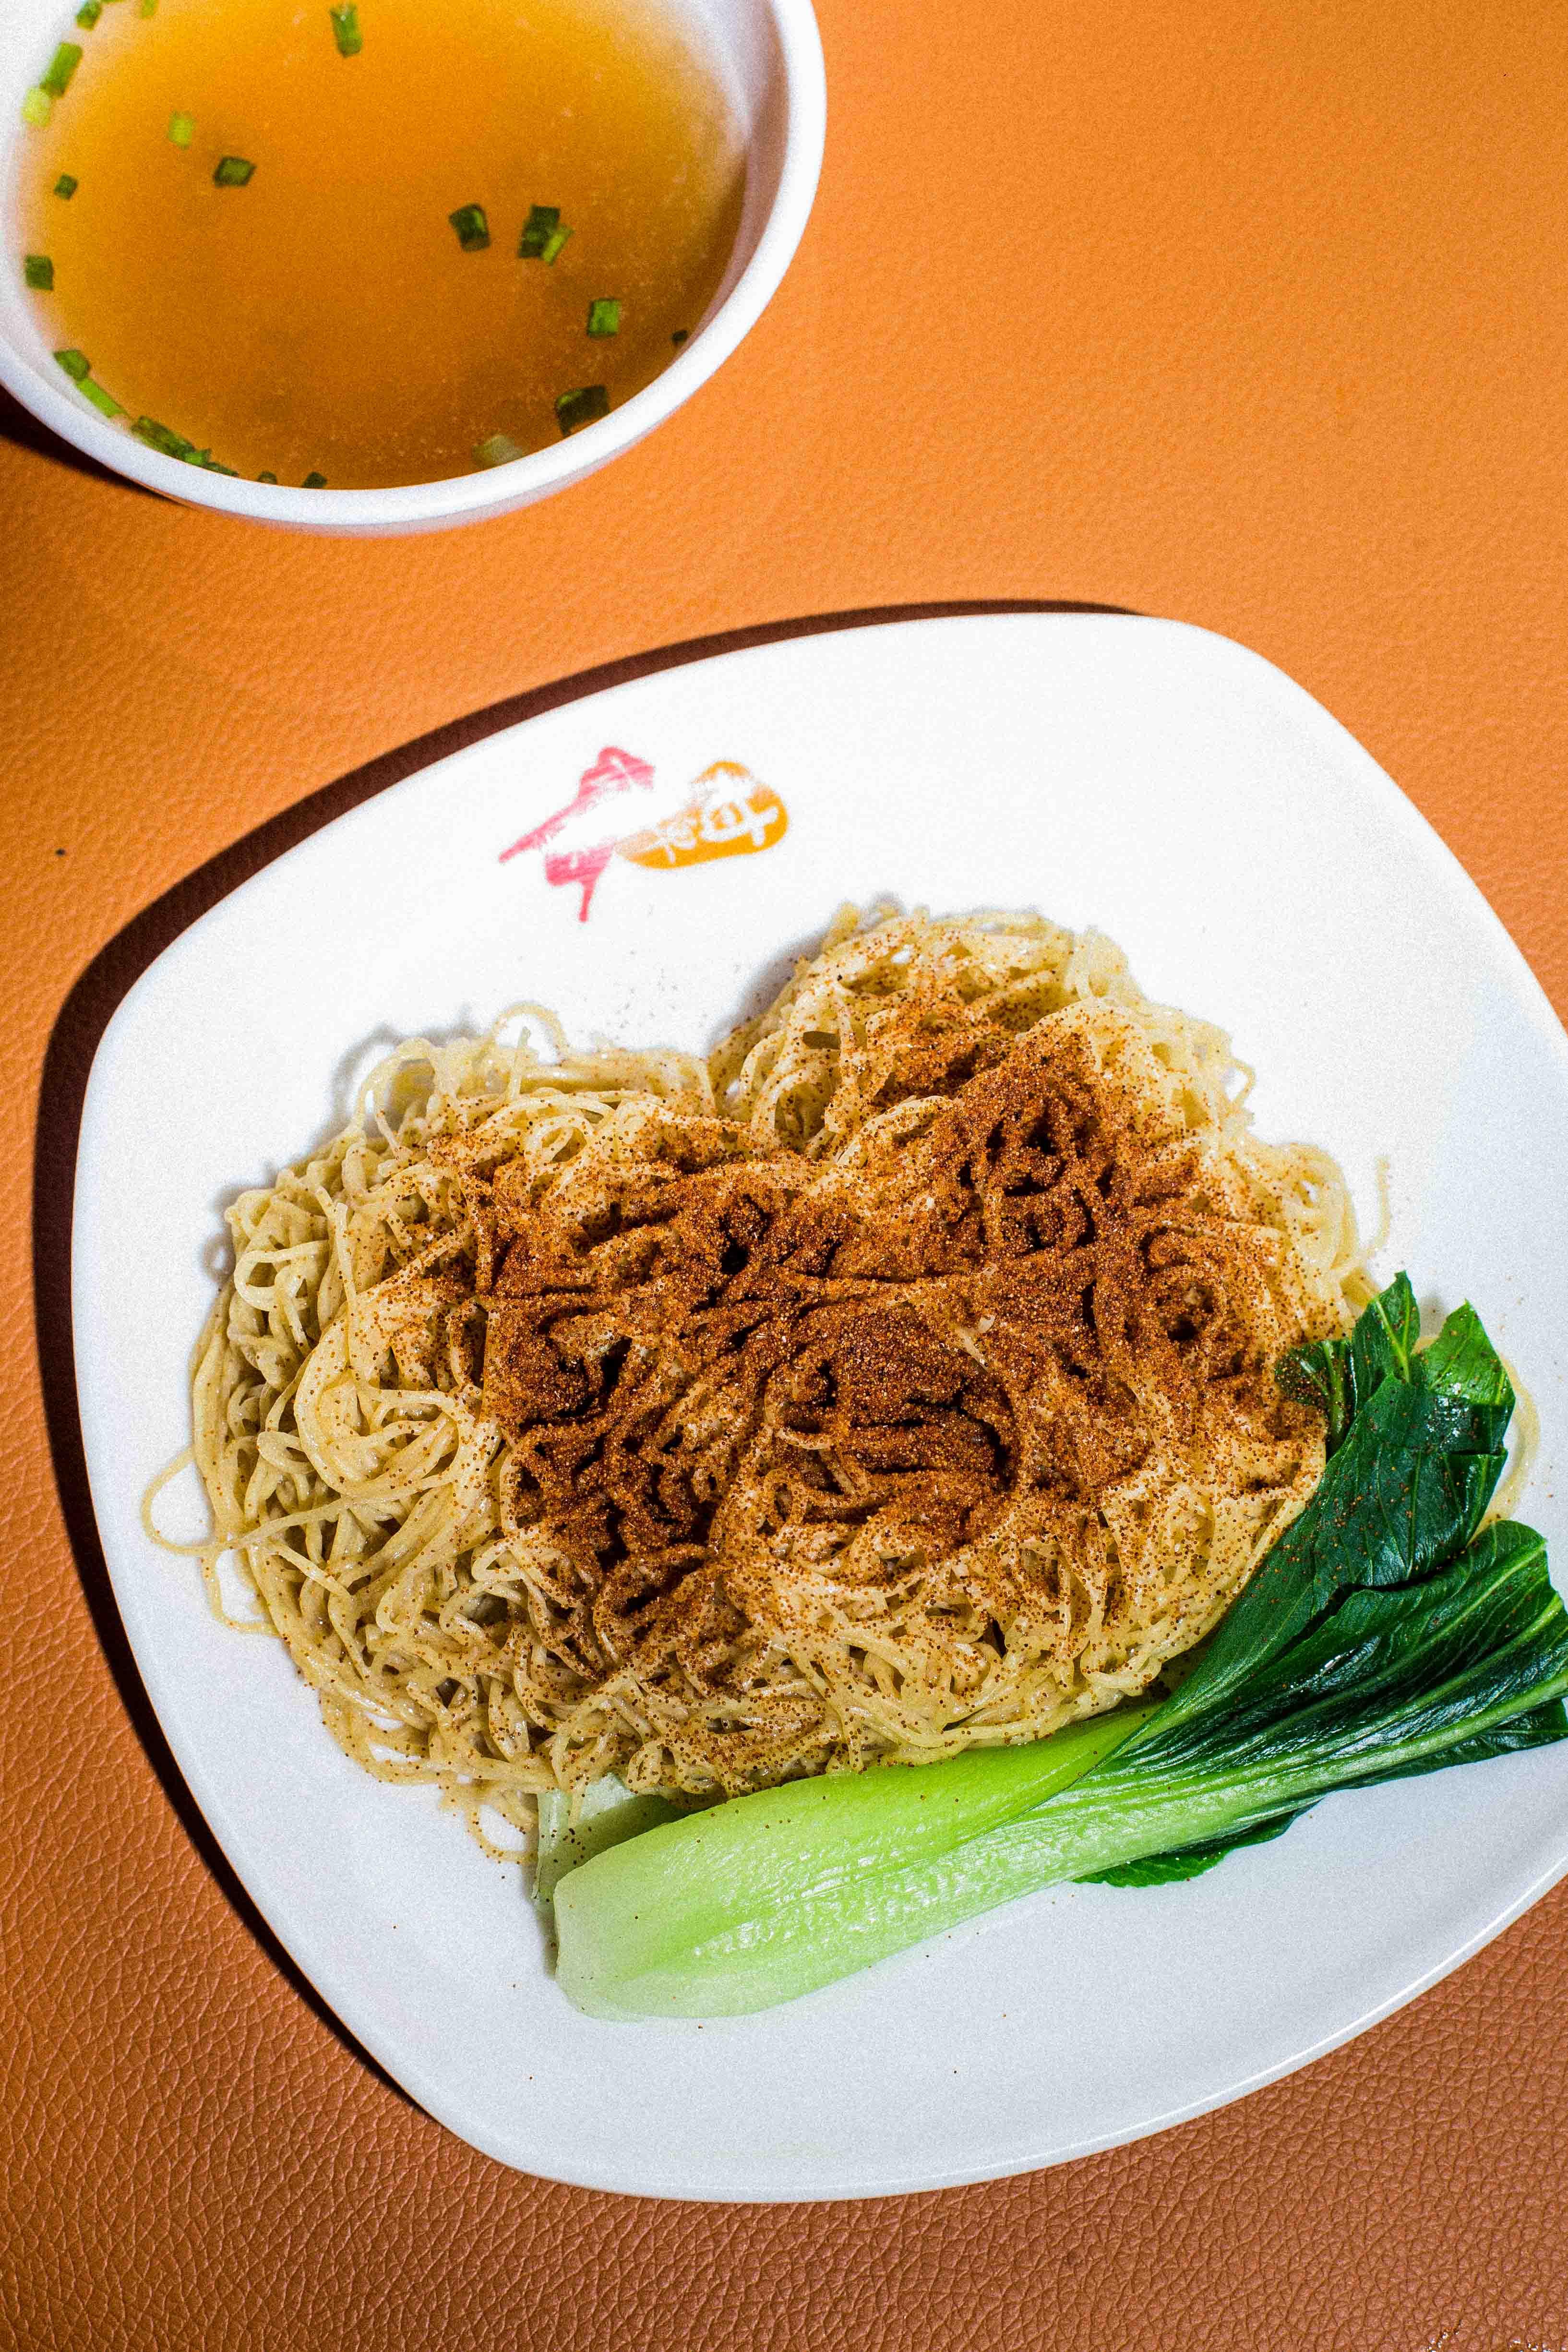 nolisoli eats restaurant kam's roast